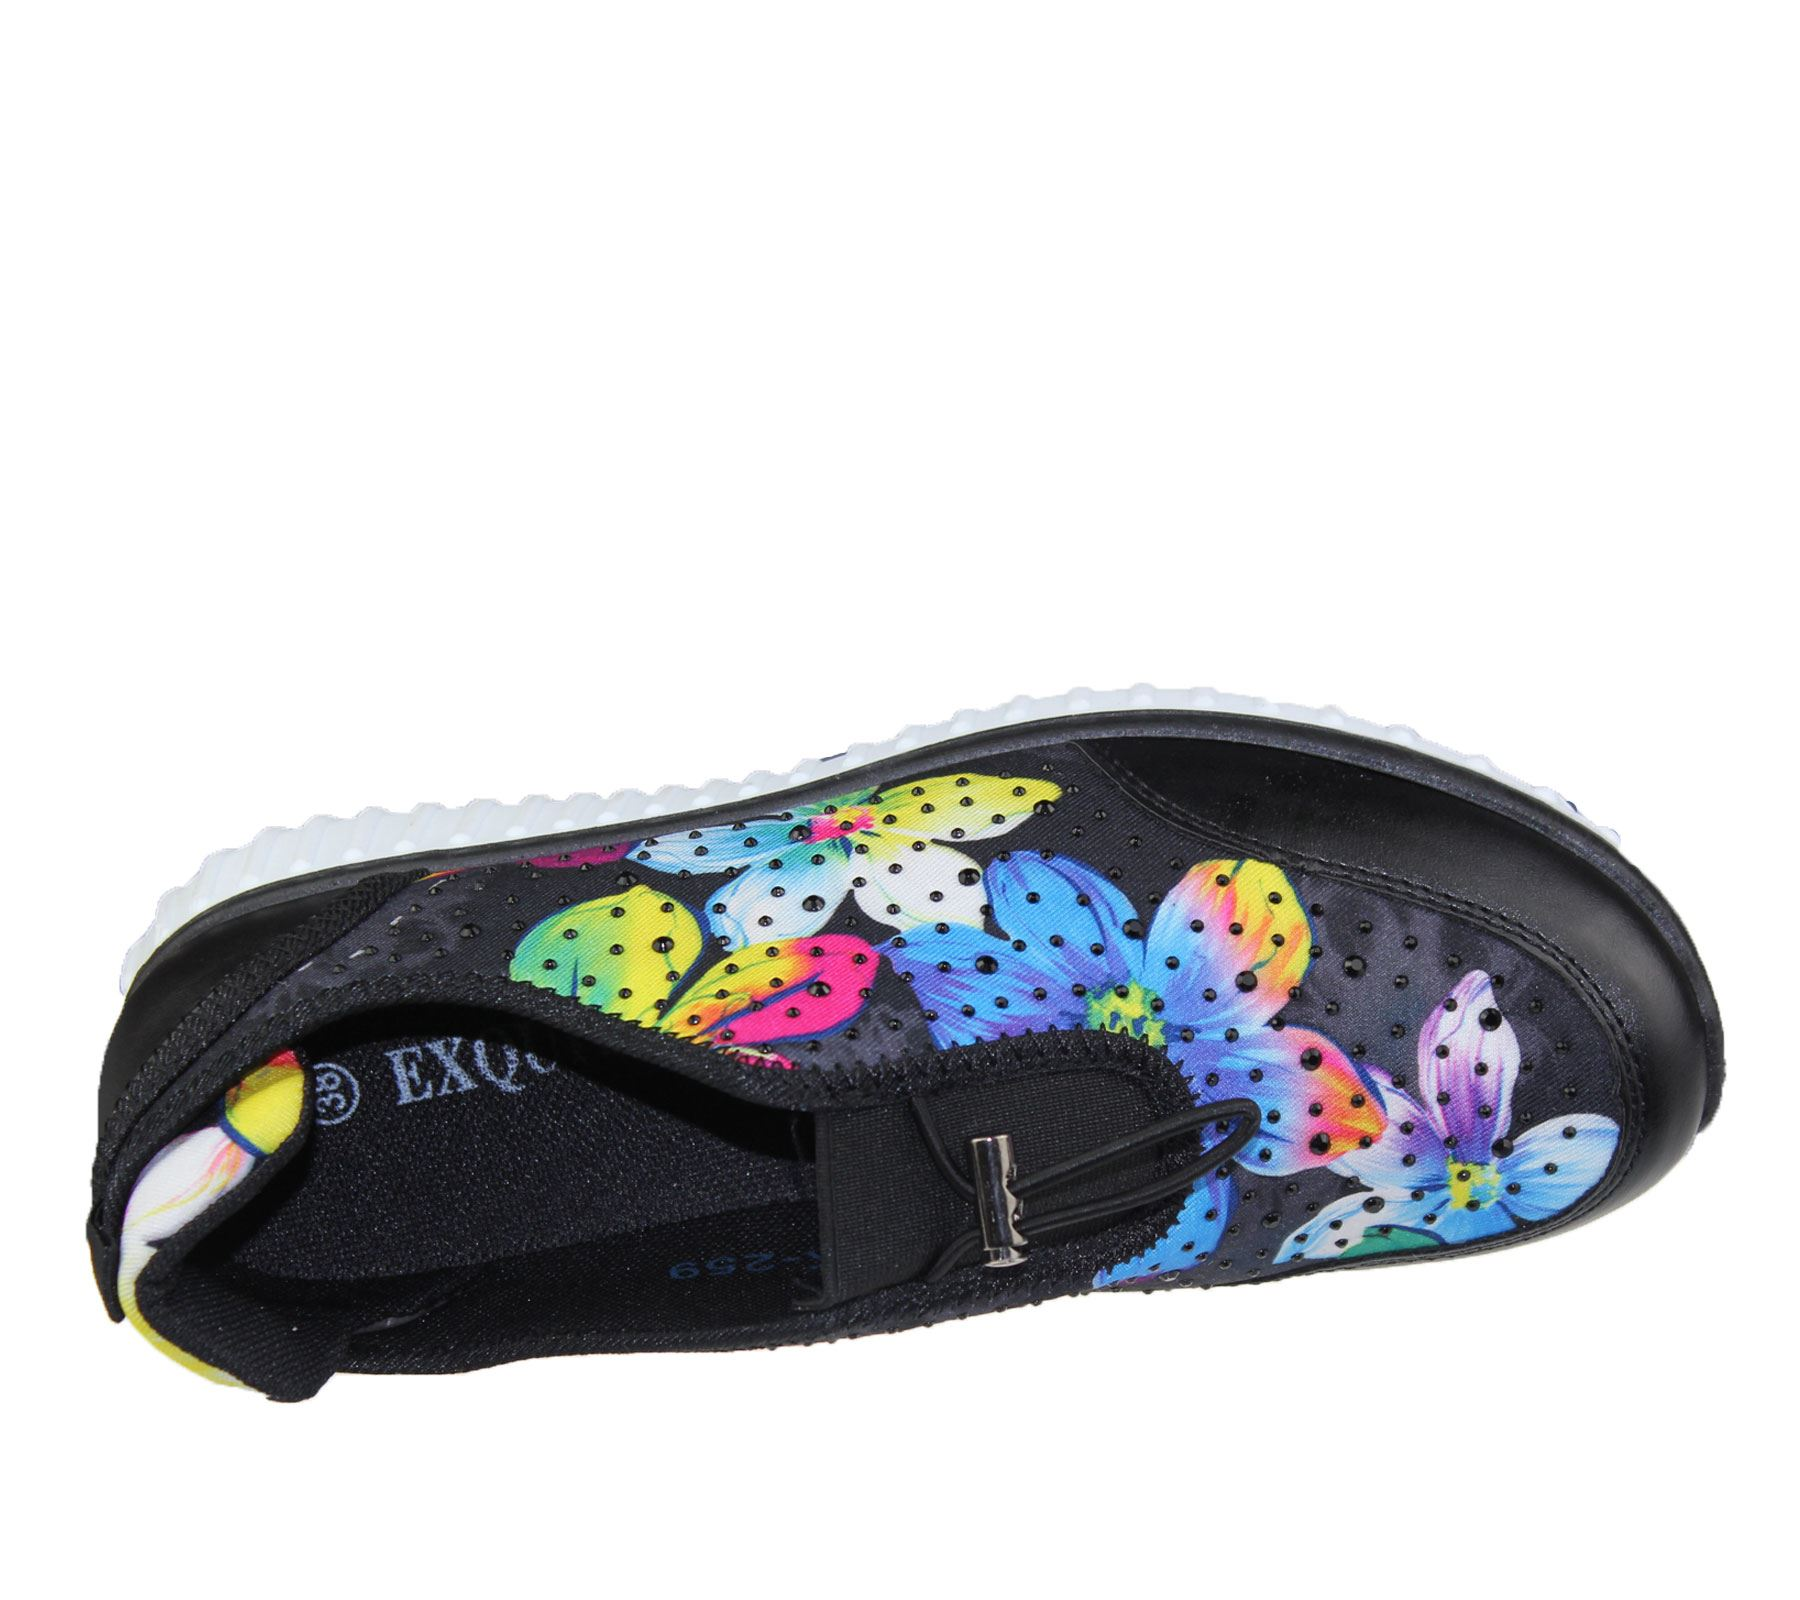 Womens-Trainer-Ladies-Comfort-Walking-Fashion-Summer-Gym-Sport-Flat-Shoes-Size thumbnail 7